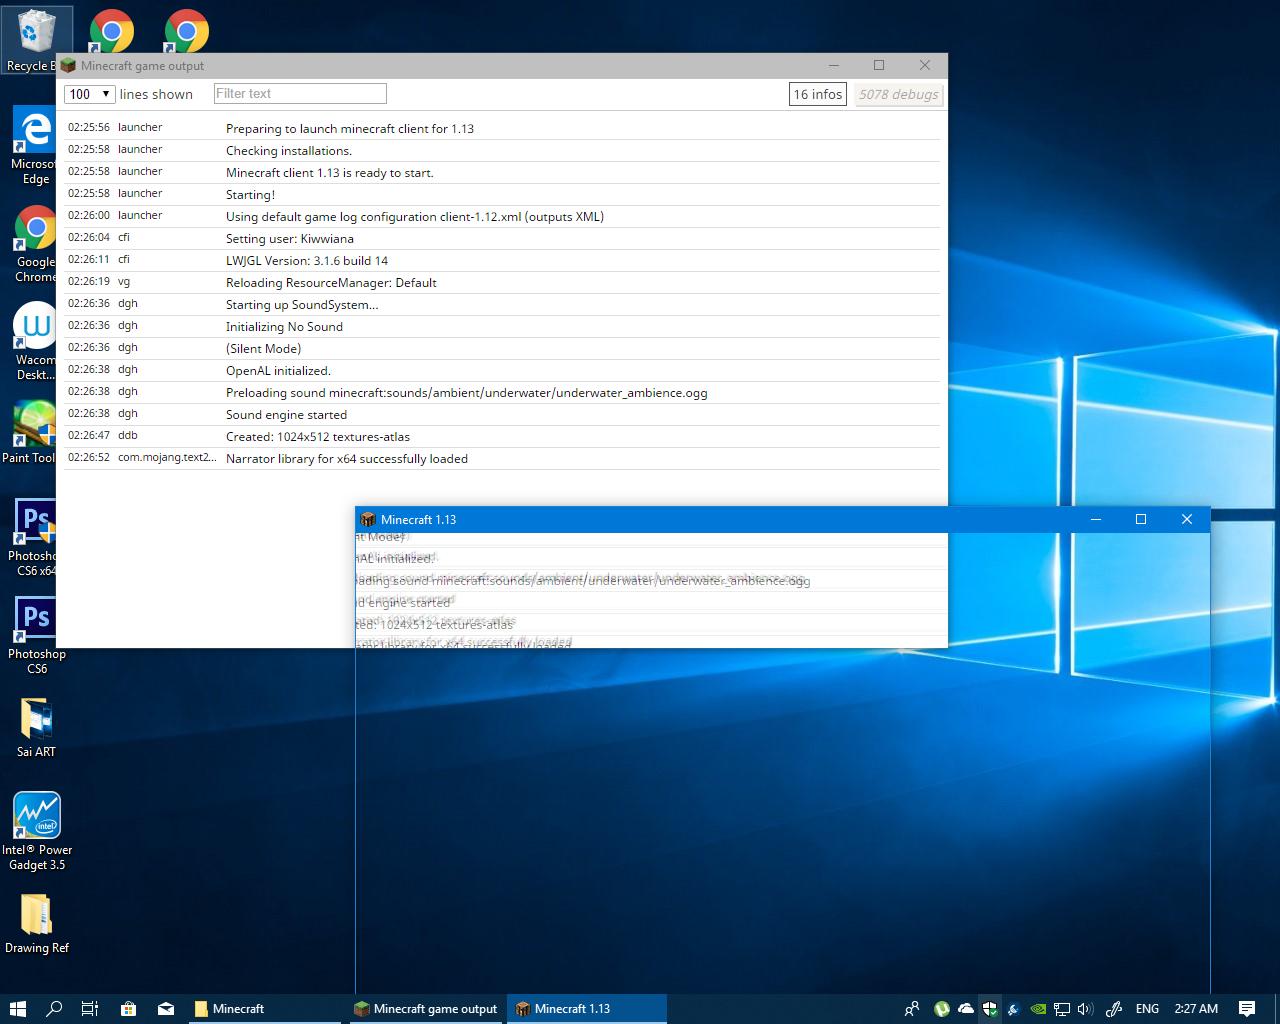 Windows 10 : Minecraft Java Edition / Blank Screen after